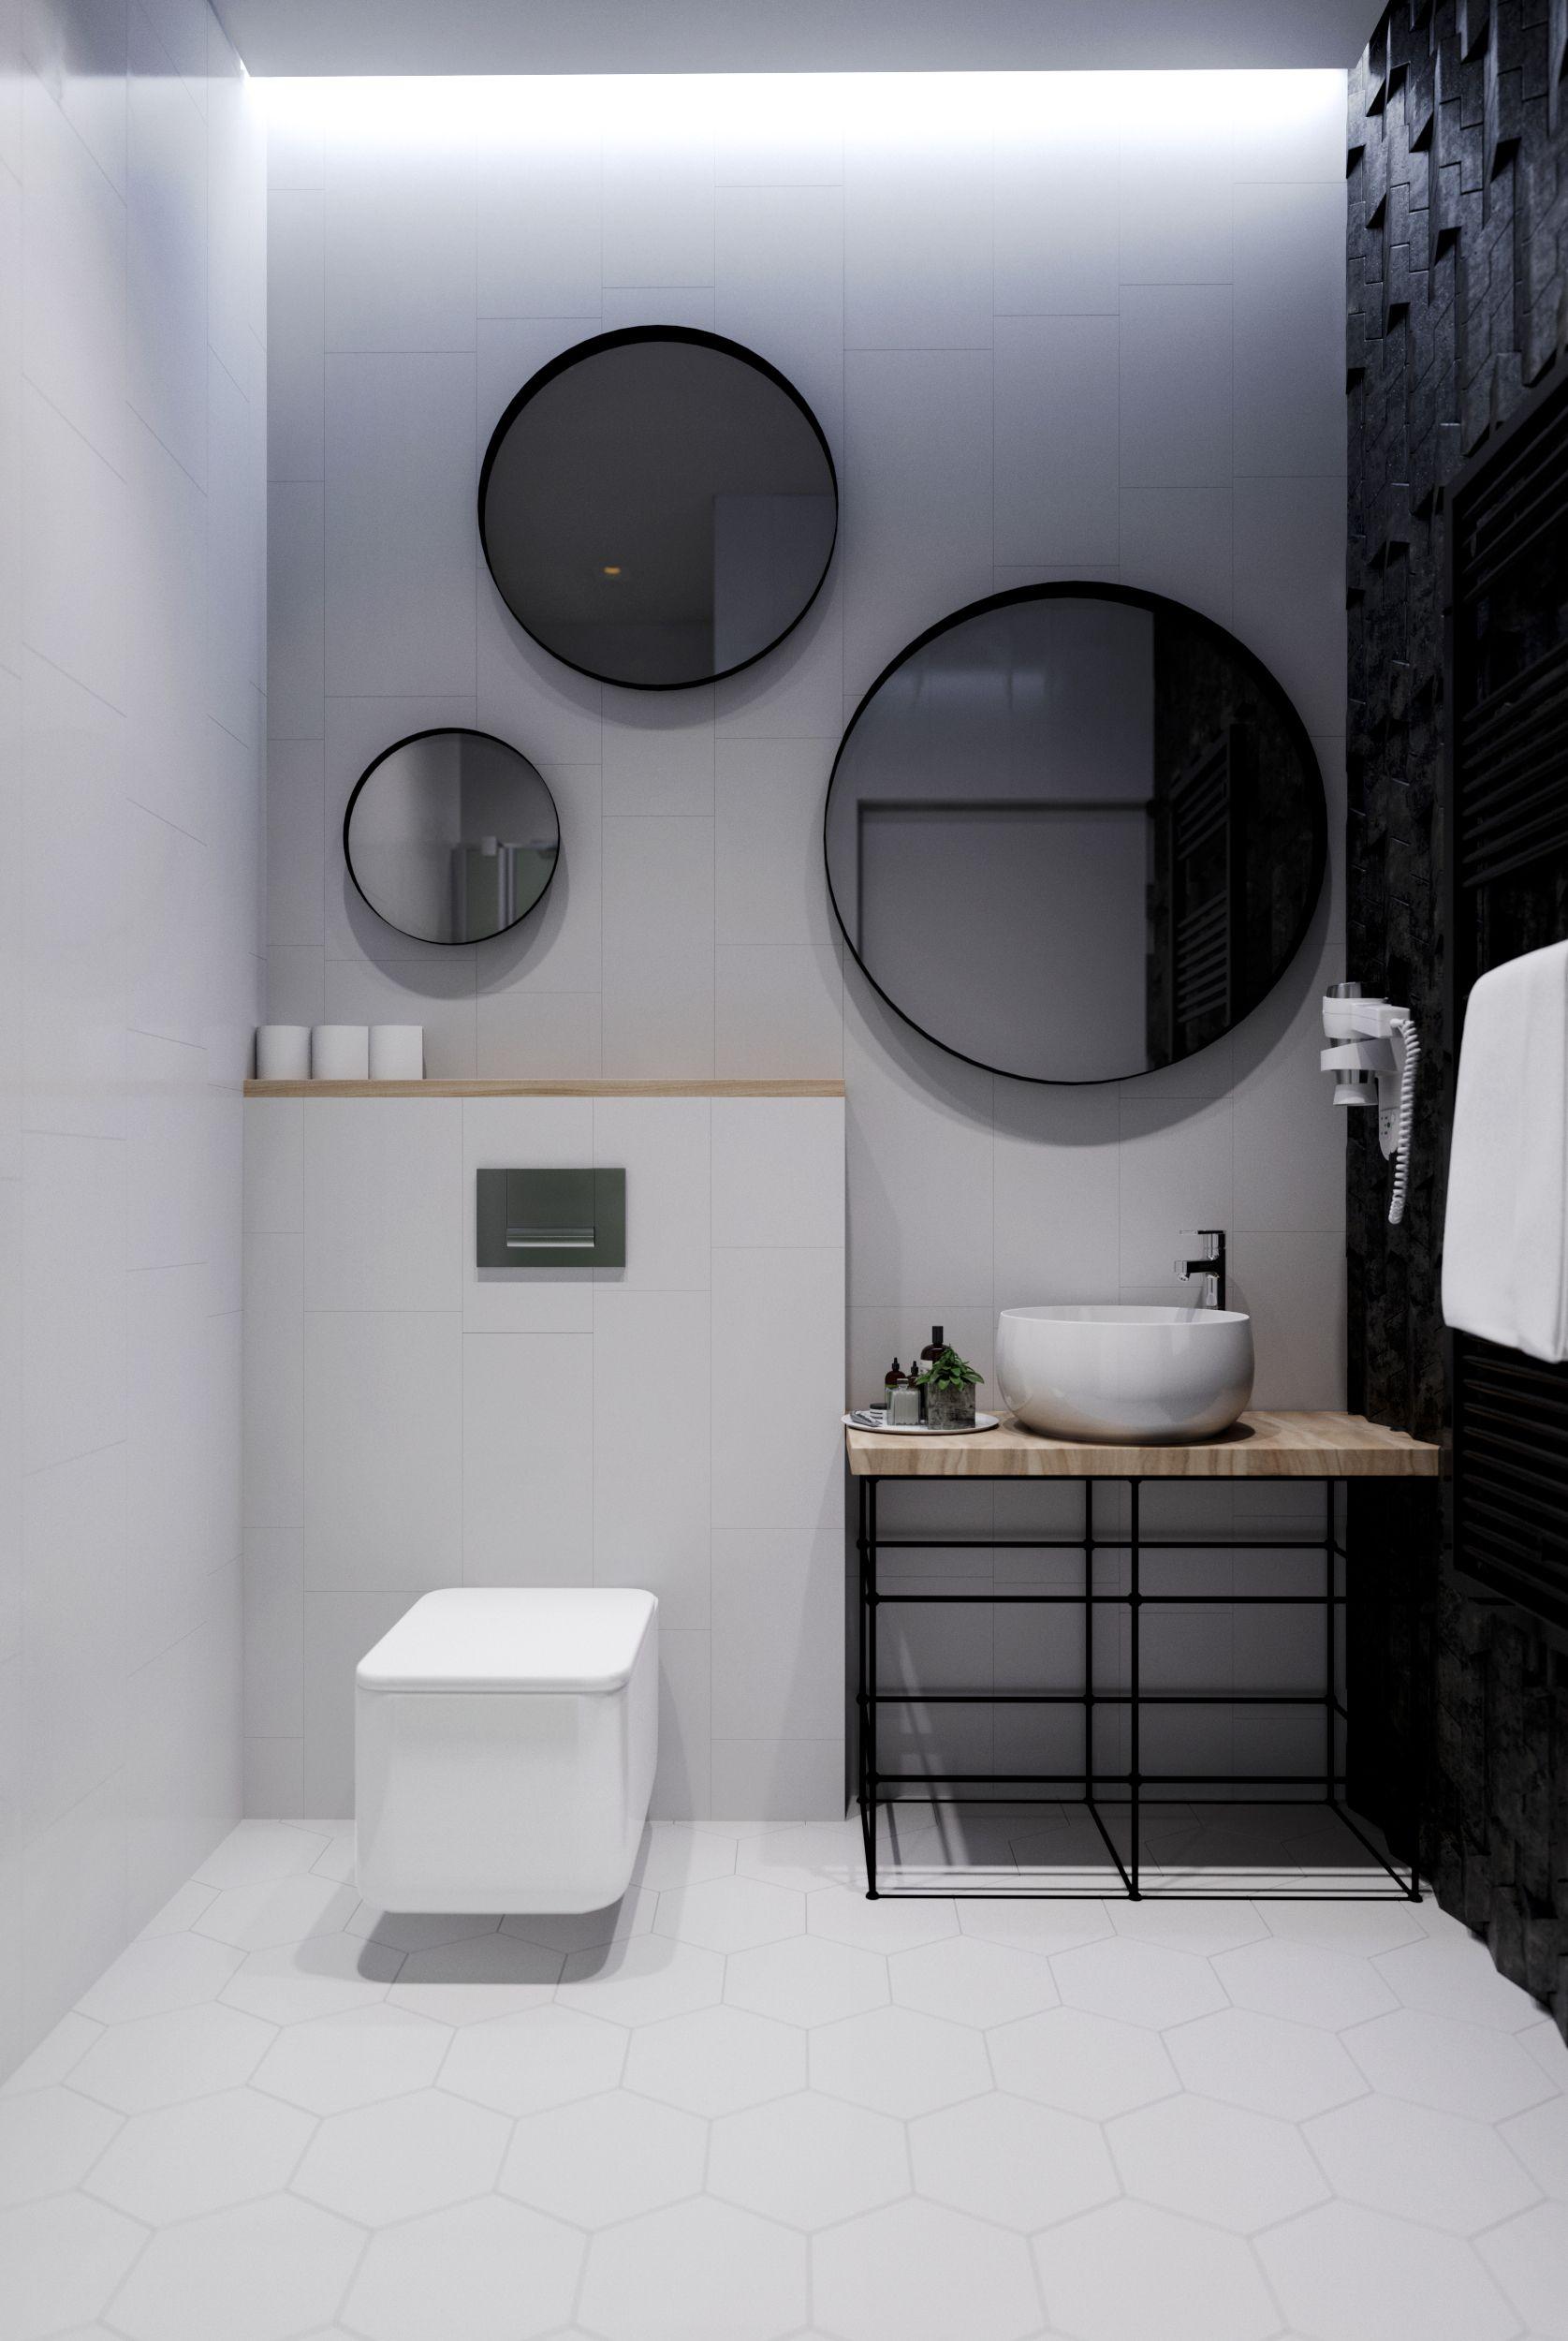 Salle De Bain Hipster ~ mini hotel salle de bain wc pinterest minis interiors and toilet